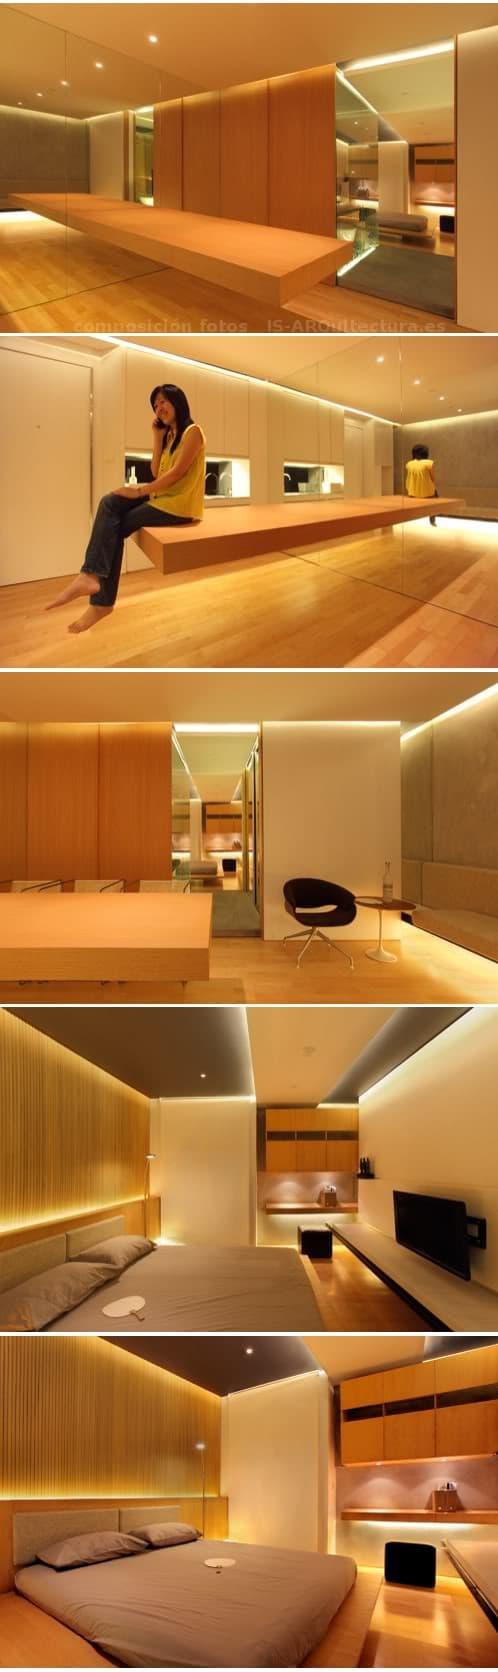 apartamento-vidrio-madera-10